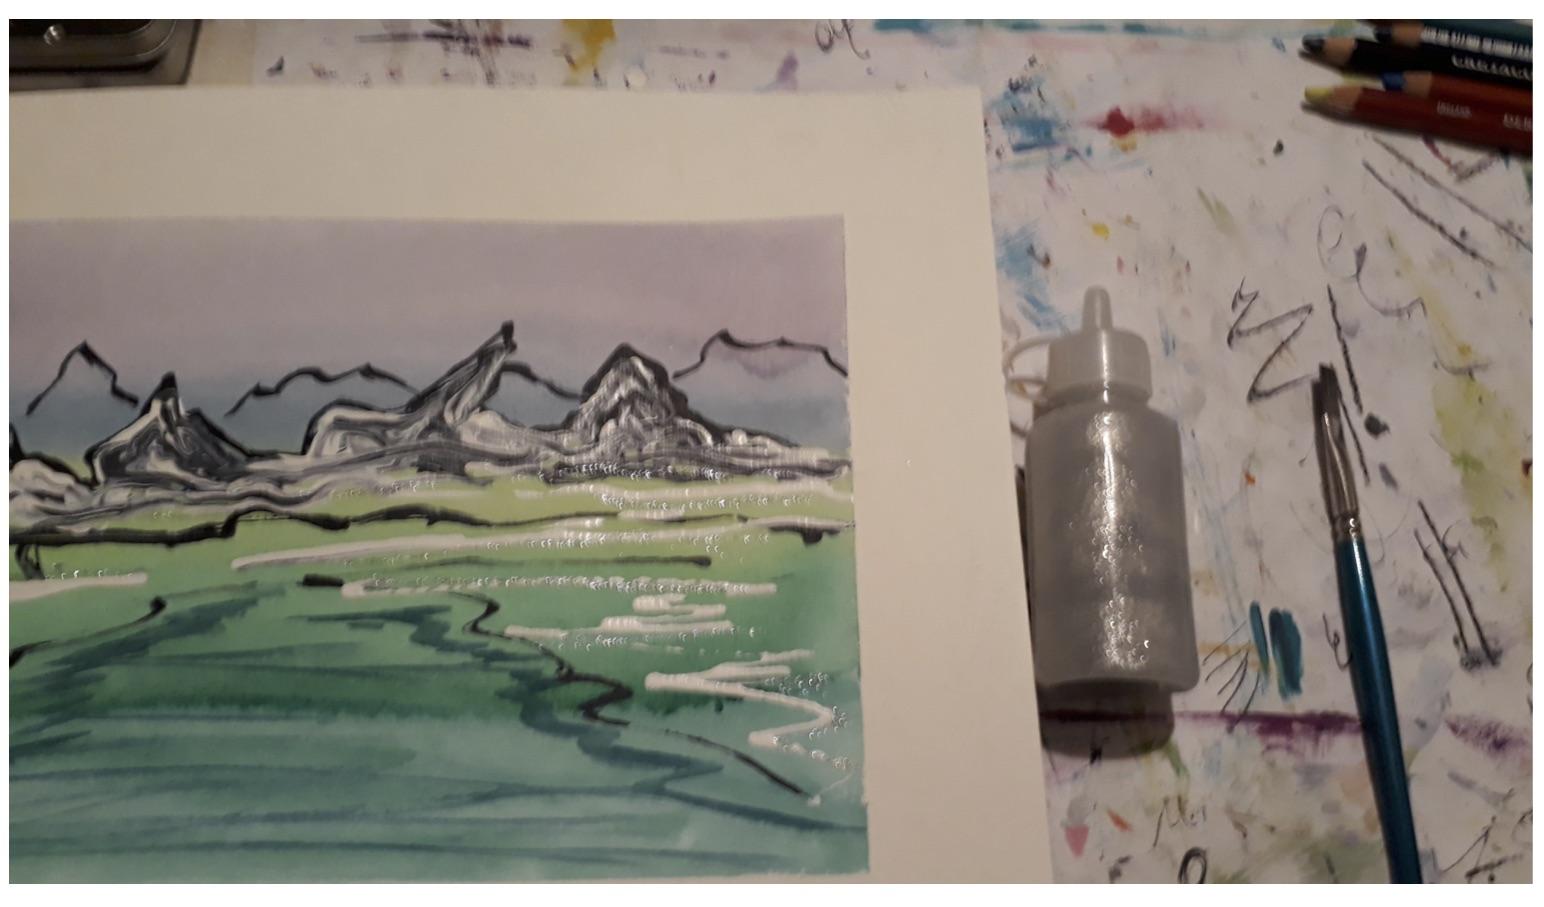 Landscape. Silvery water with glue bottle.